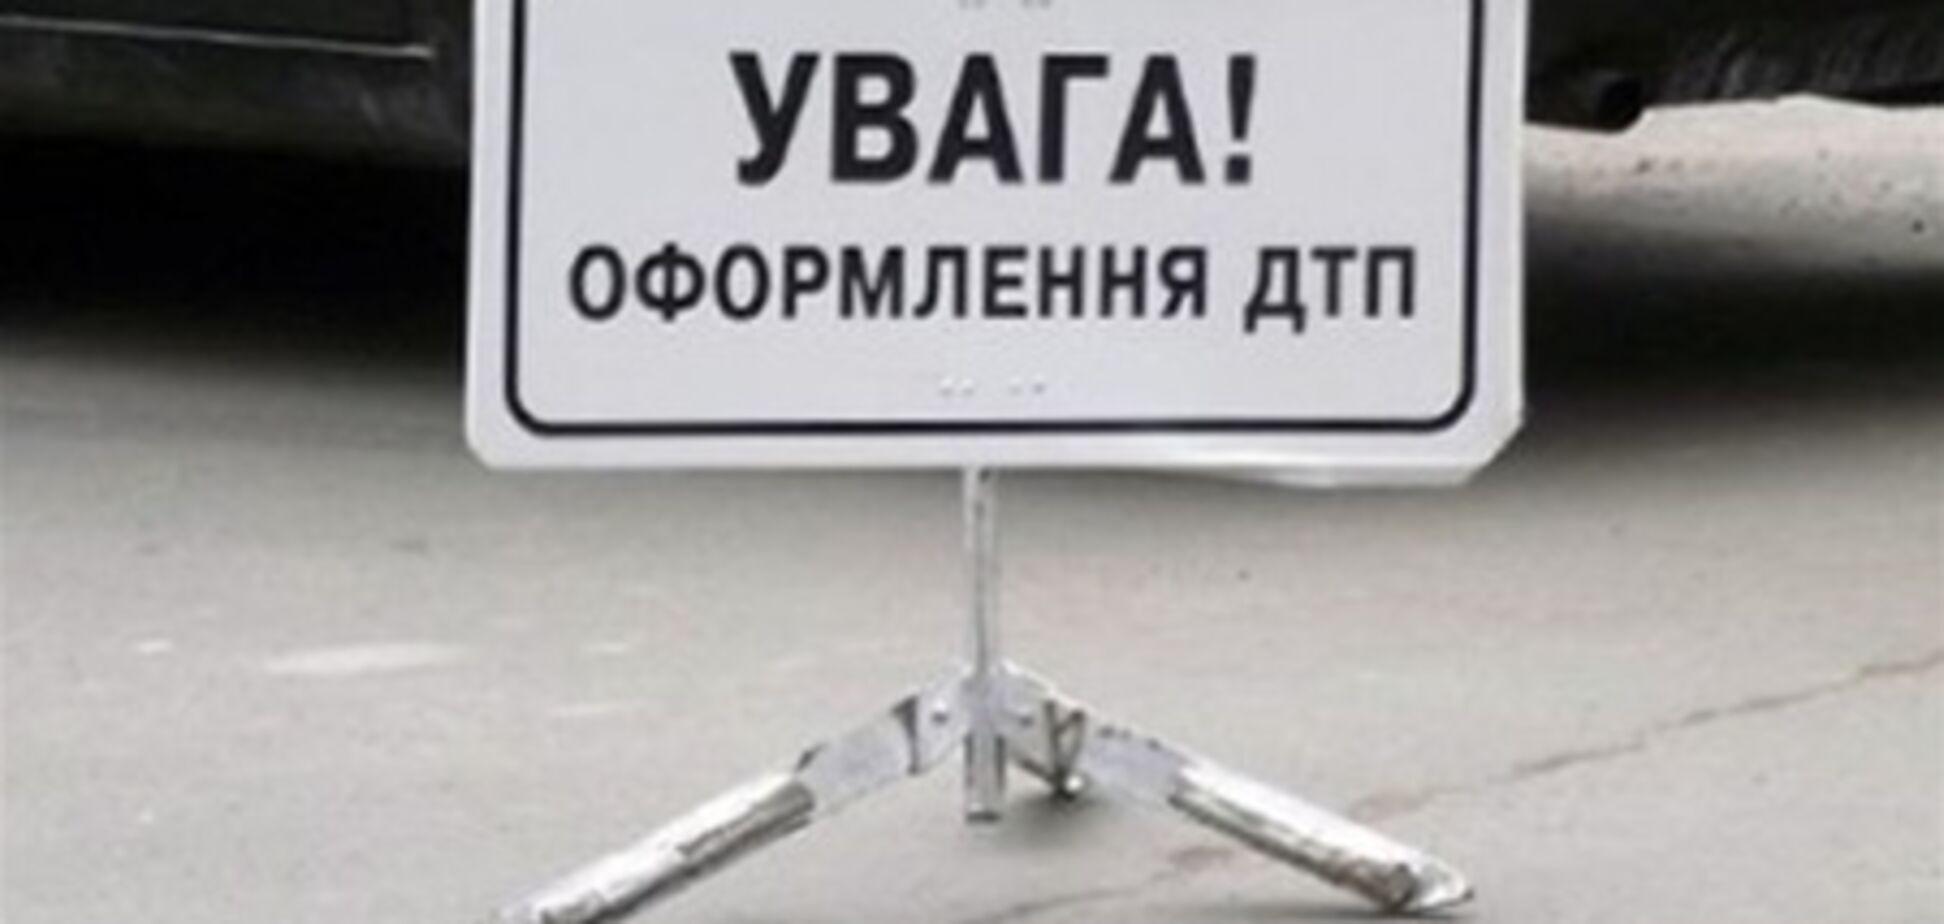 У ДТП загинув суддя Полтавського районного суду та його син